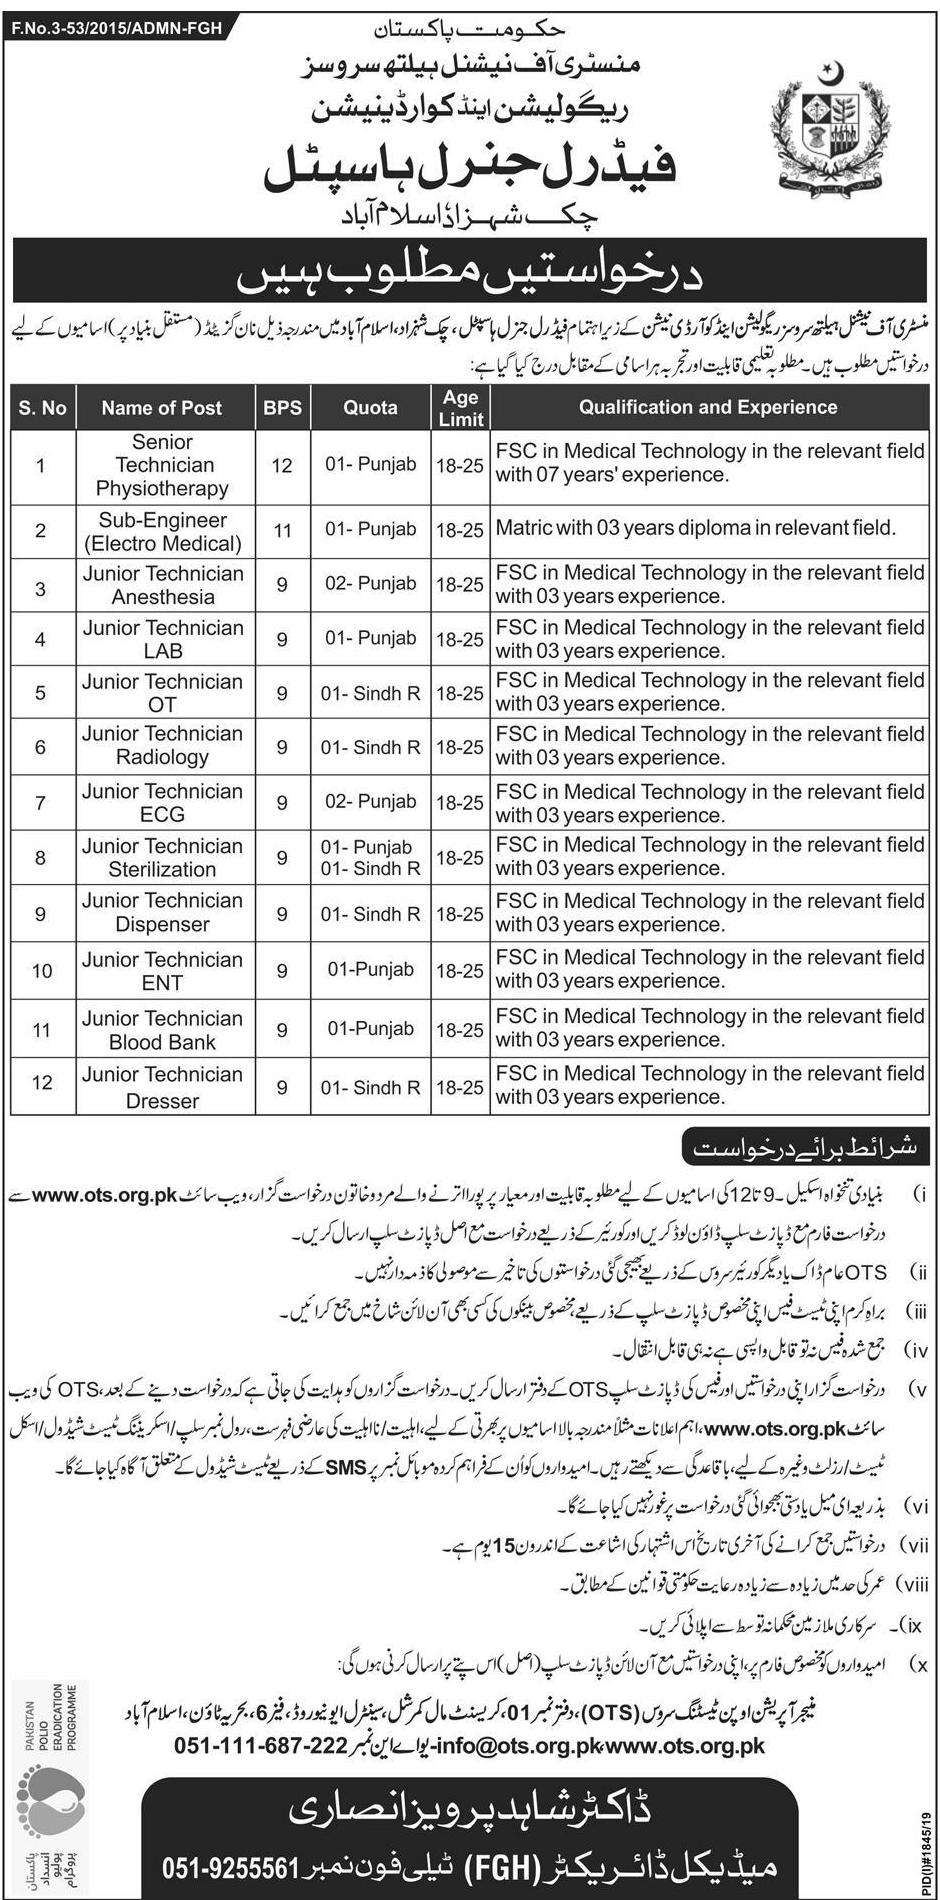 Chak Shahzad Federal General Hospital Islamabad Jobs Via OTS